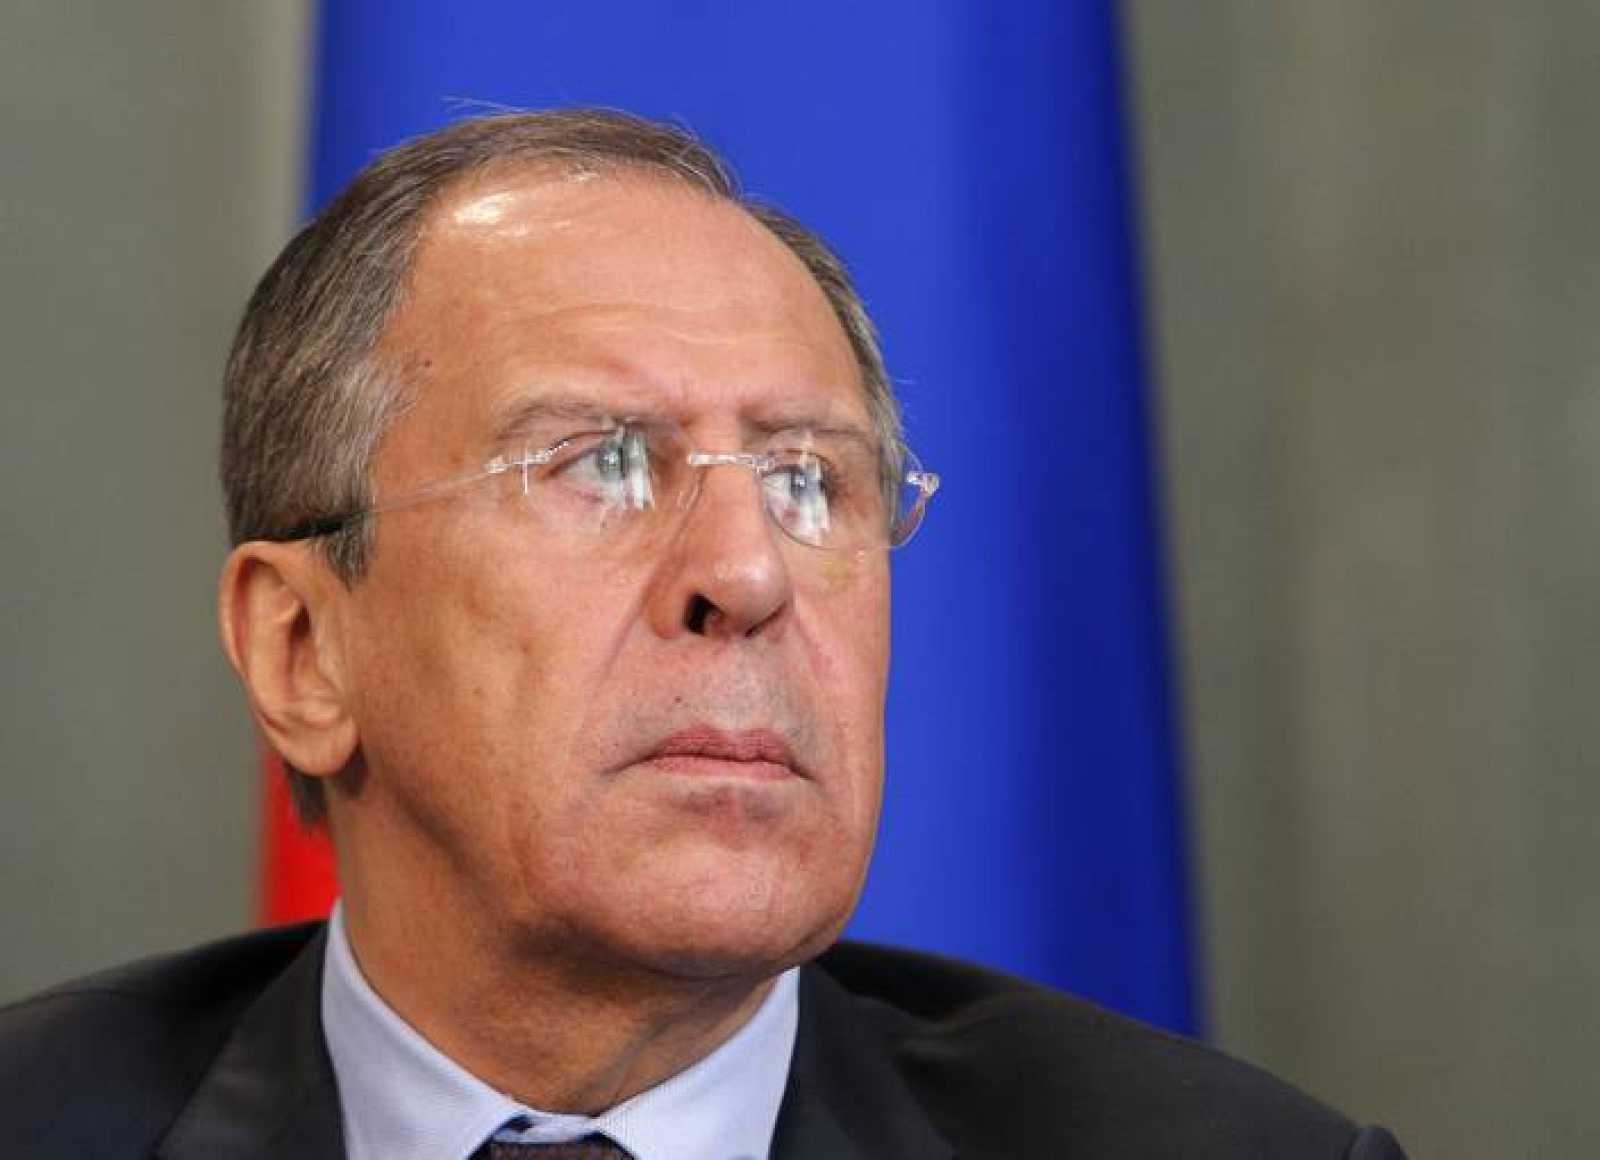 El ministro de Exteriores de Rusia, Serguei Lavrov